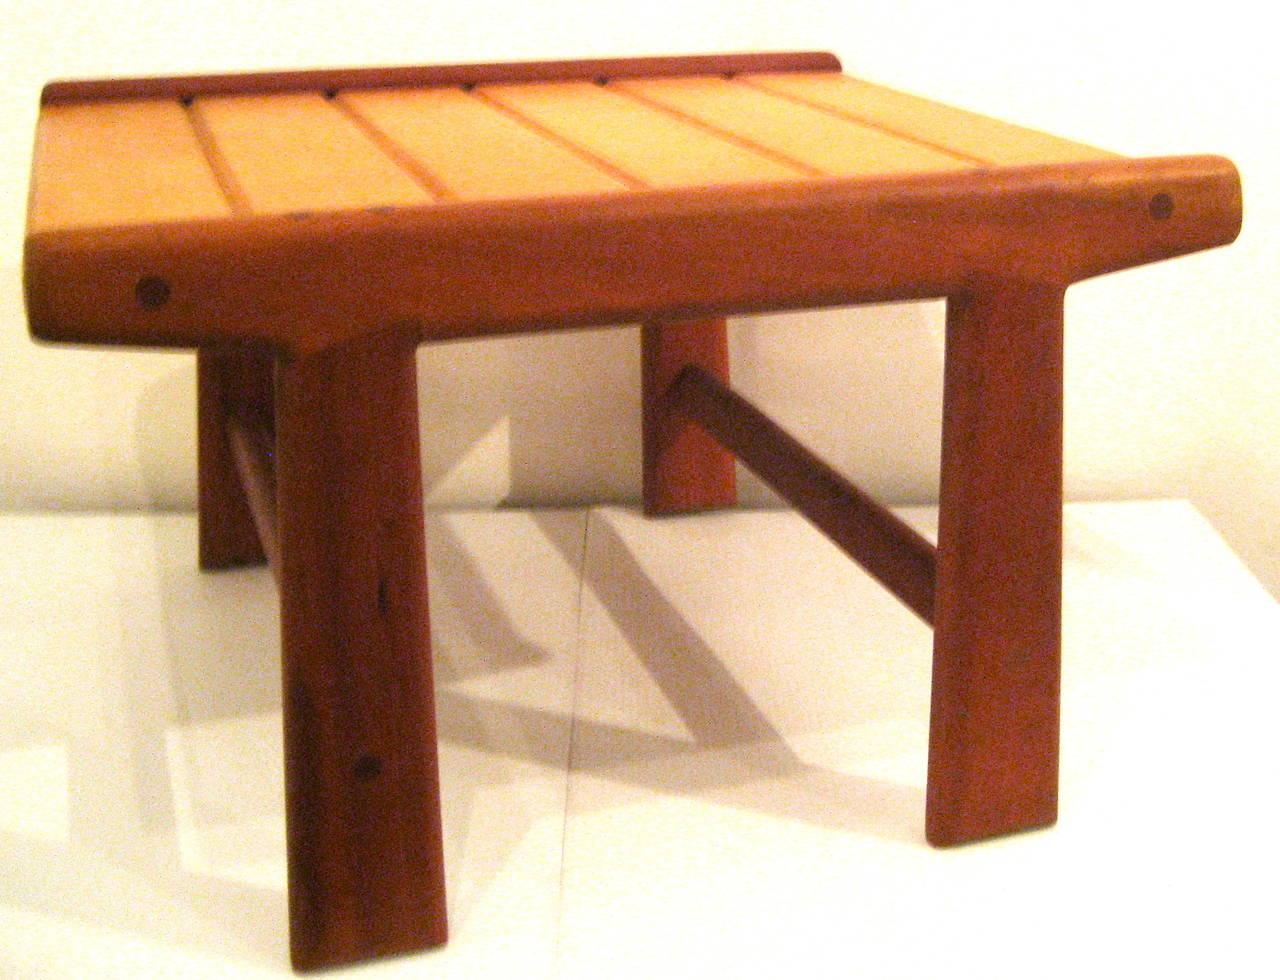 Danish Modern Noguchi Style Low Japanese Bench Or Stool At